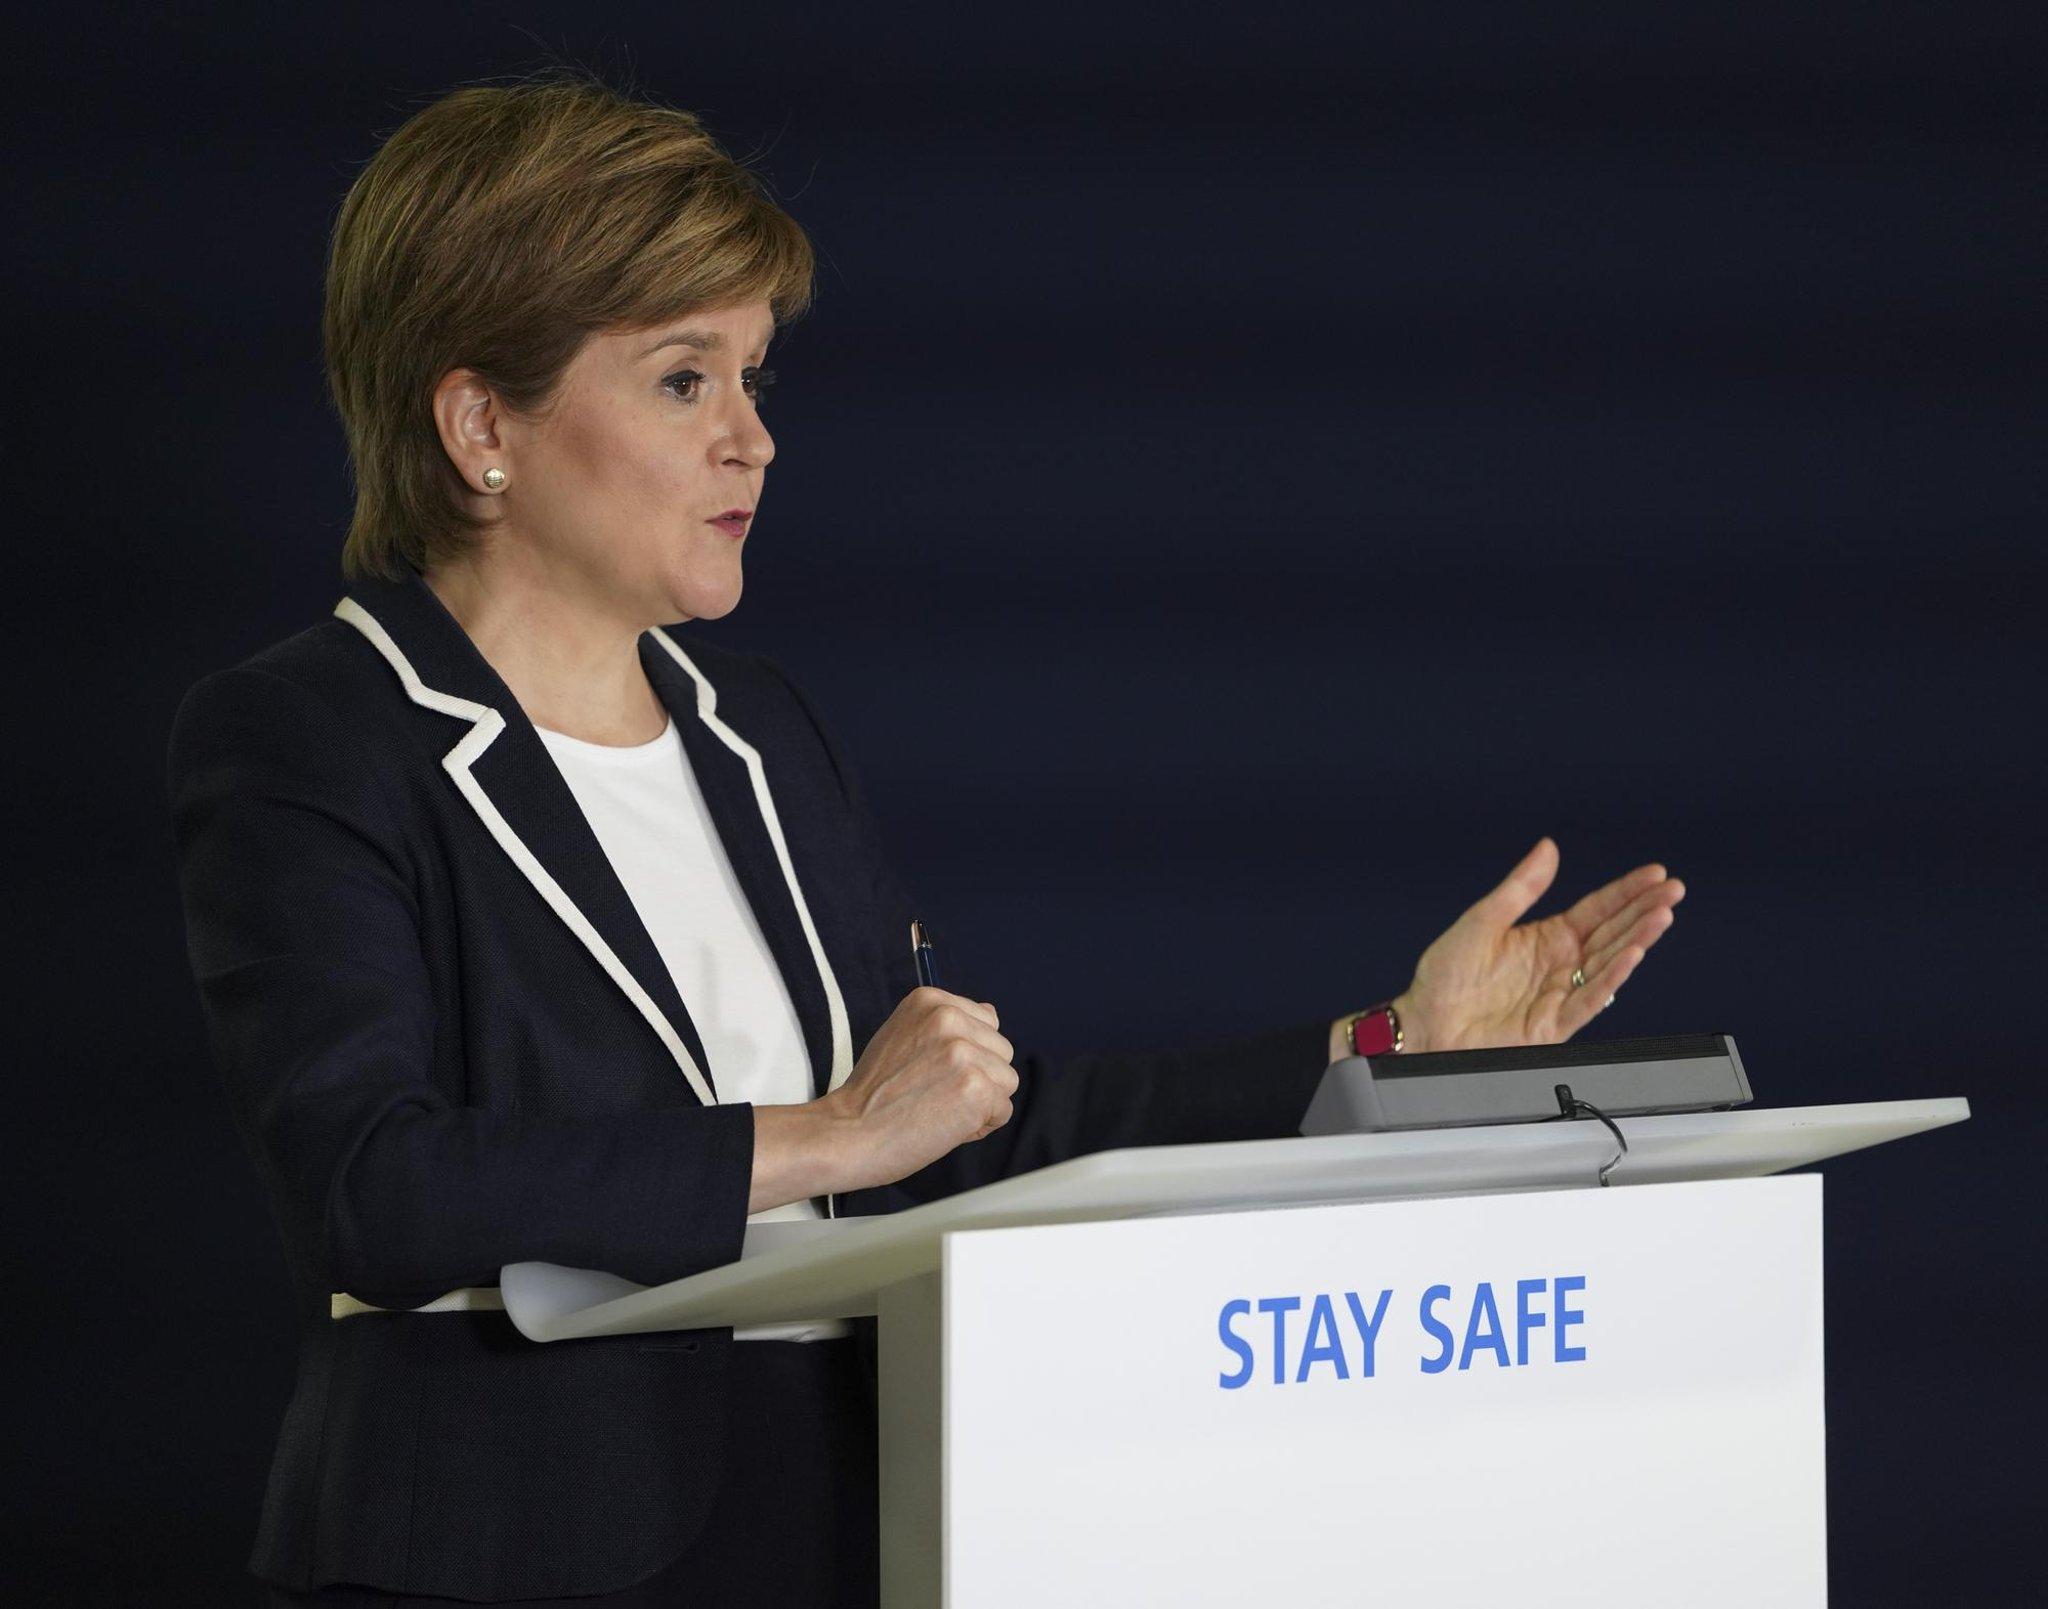 Nicola Sturgeon's 'Level 0.5' leaves Scotland in limbo say Tories